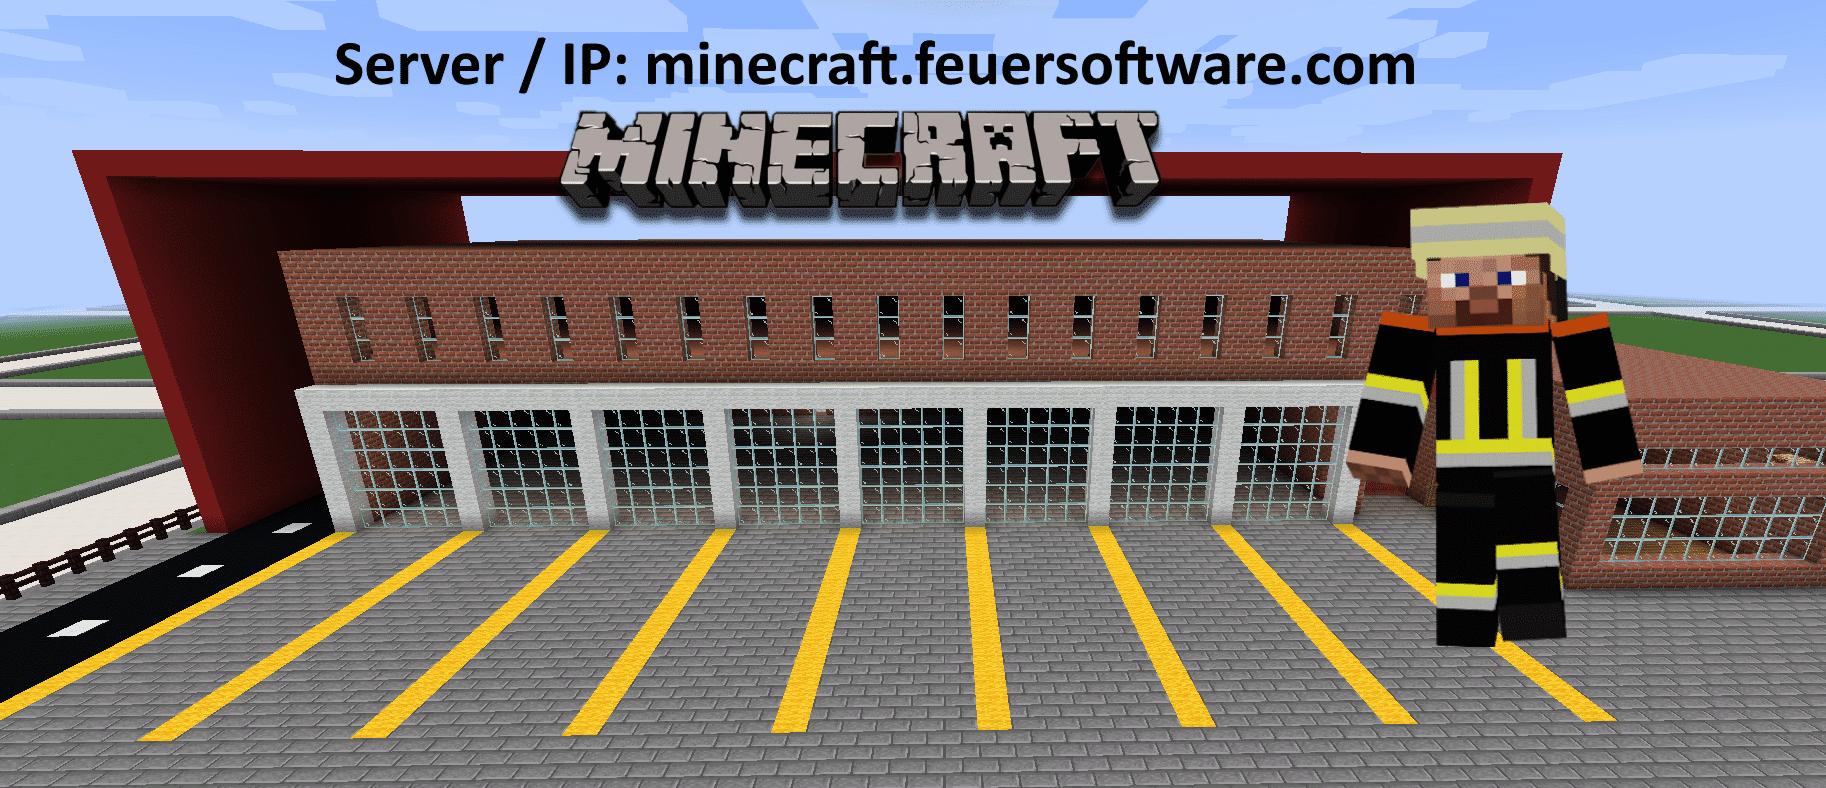 FeuerSoftware_Minecraft_Header-1.png